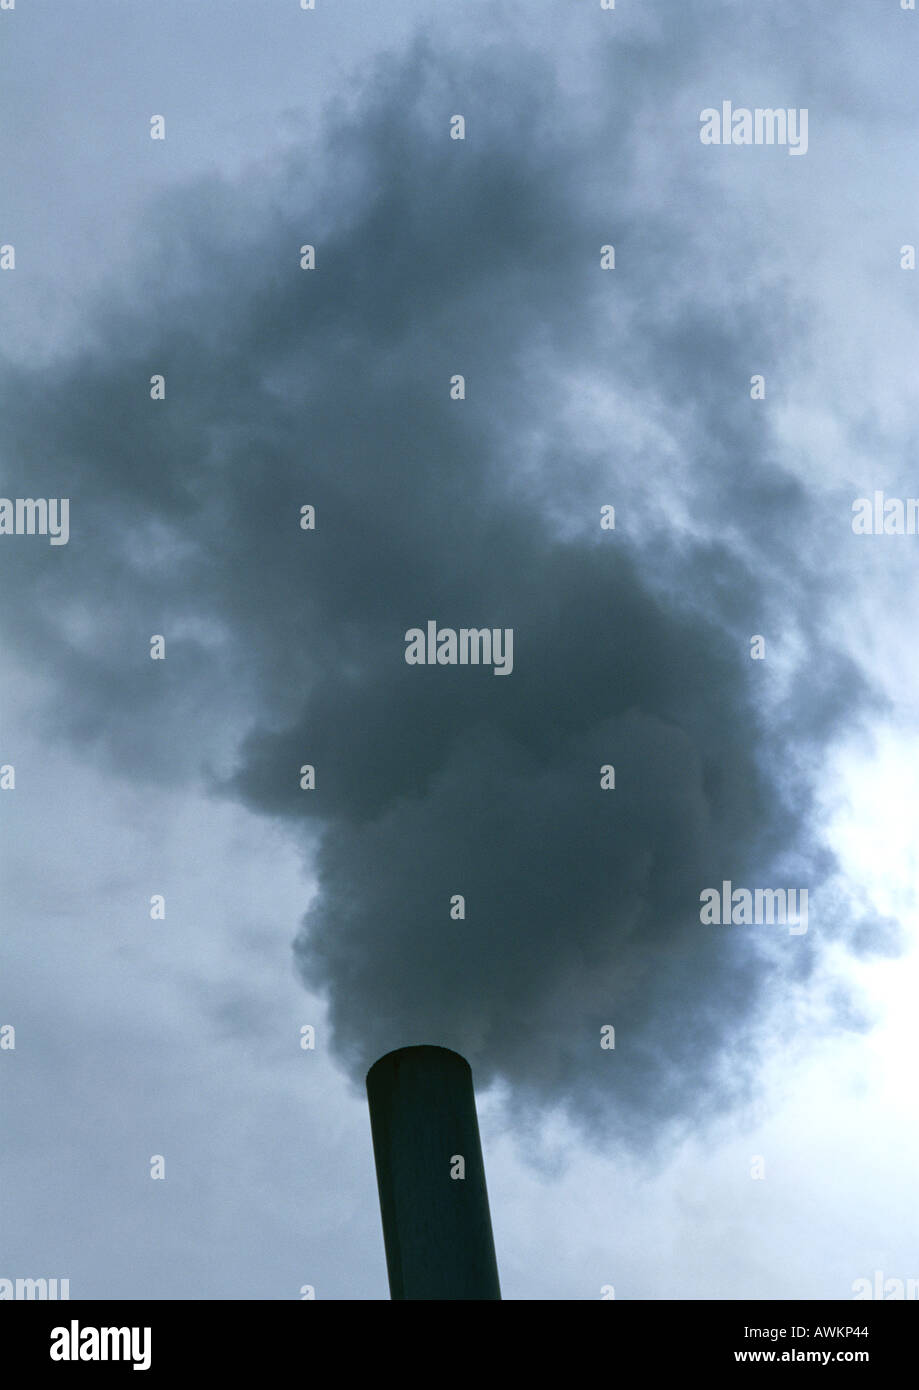 Smoke from a smoke stack, low angle view - Stock Image